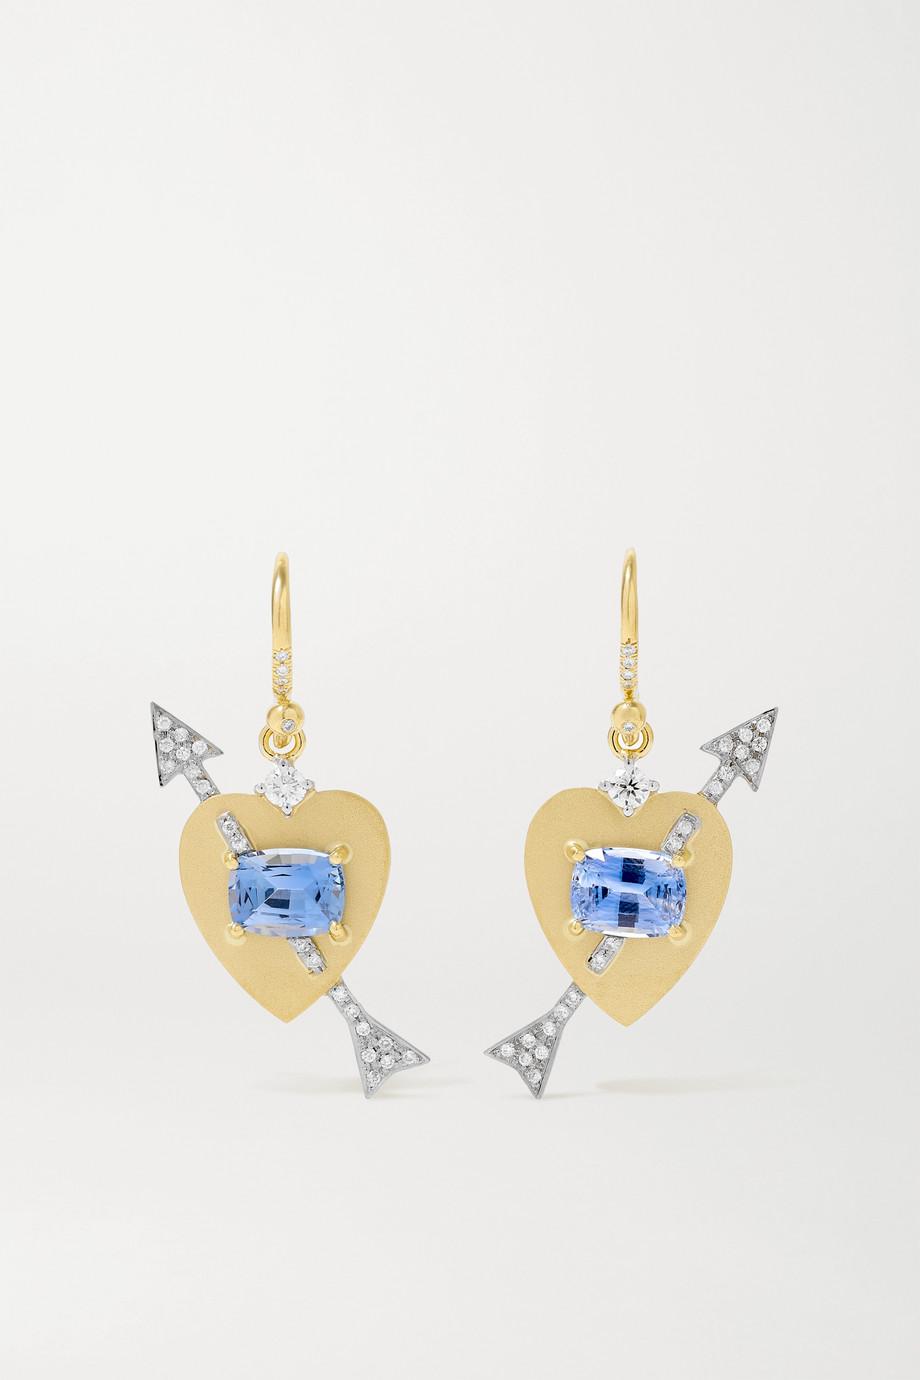 Irene Neuwirth True Love 18K 黄金、18K 白金、蓝宝石、钻石耳环